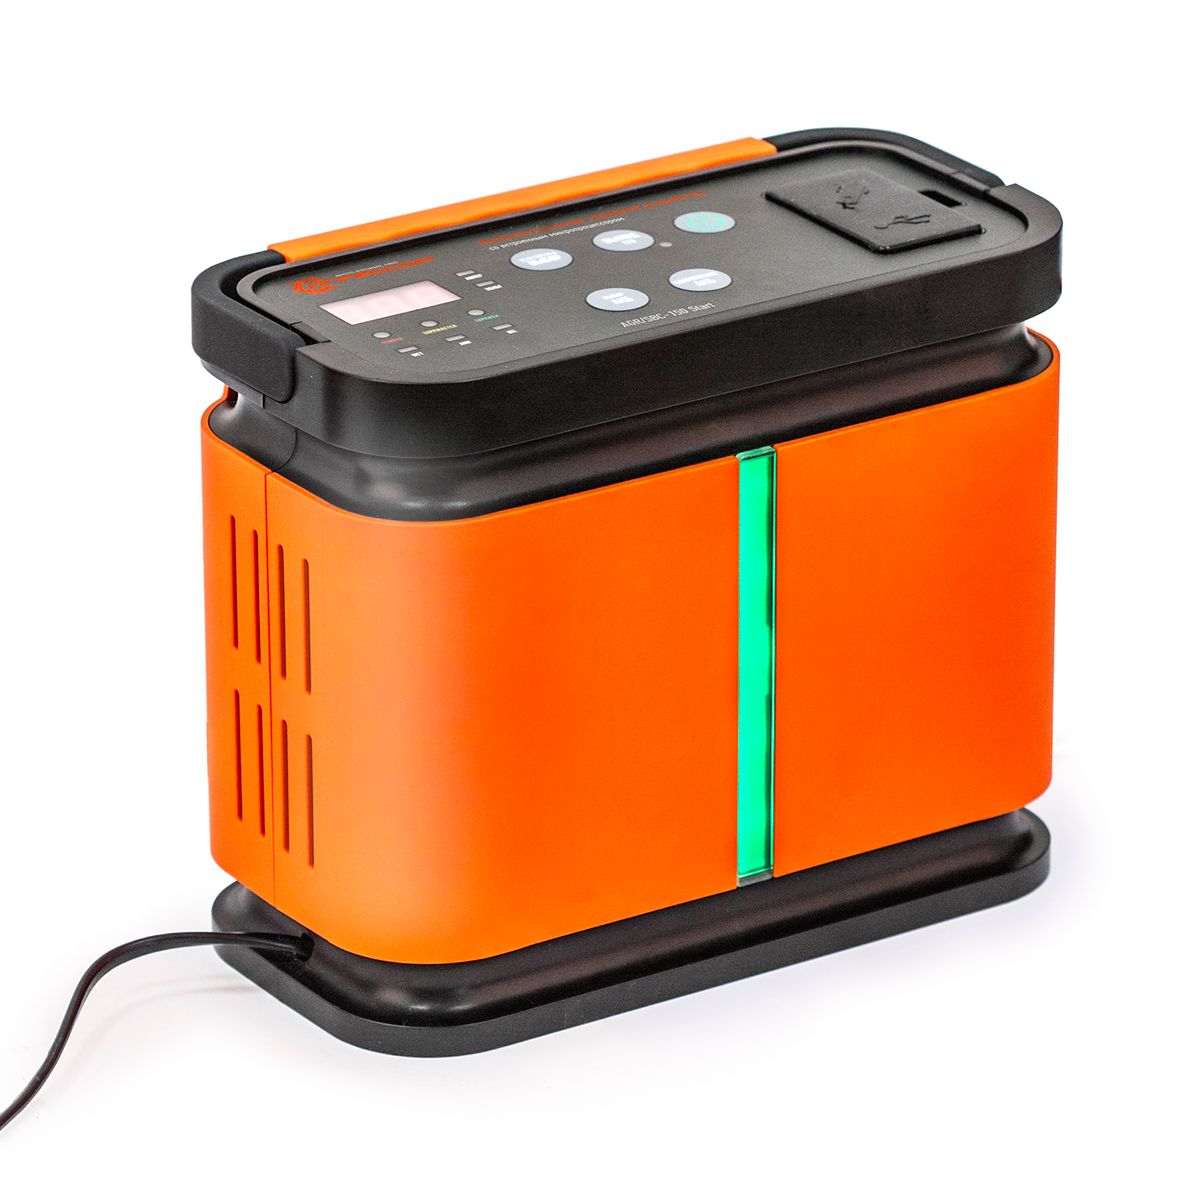 Устройство зарядное цифровое Autoprofi Агрессор AGR/SBC-150, 9 фаз зарядки, ток 2/6/10/15 А autoprofi agr 110h